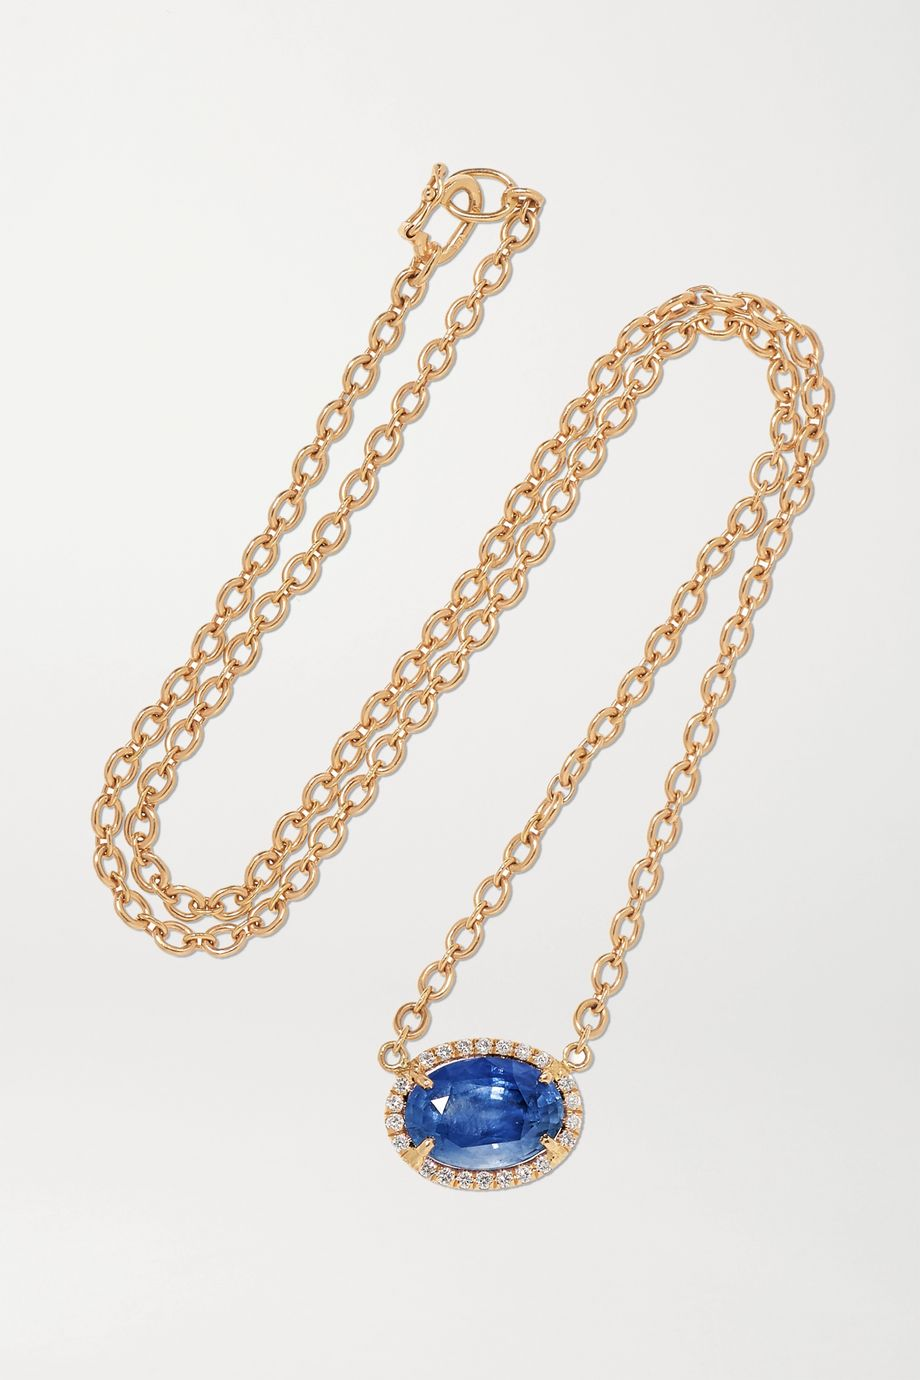 Irene Neuwirth Gemmy Gem 18-karat rose gold, sapphire and diamond necklace